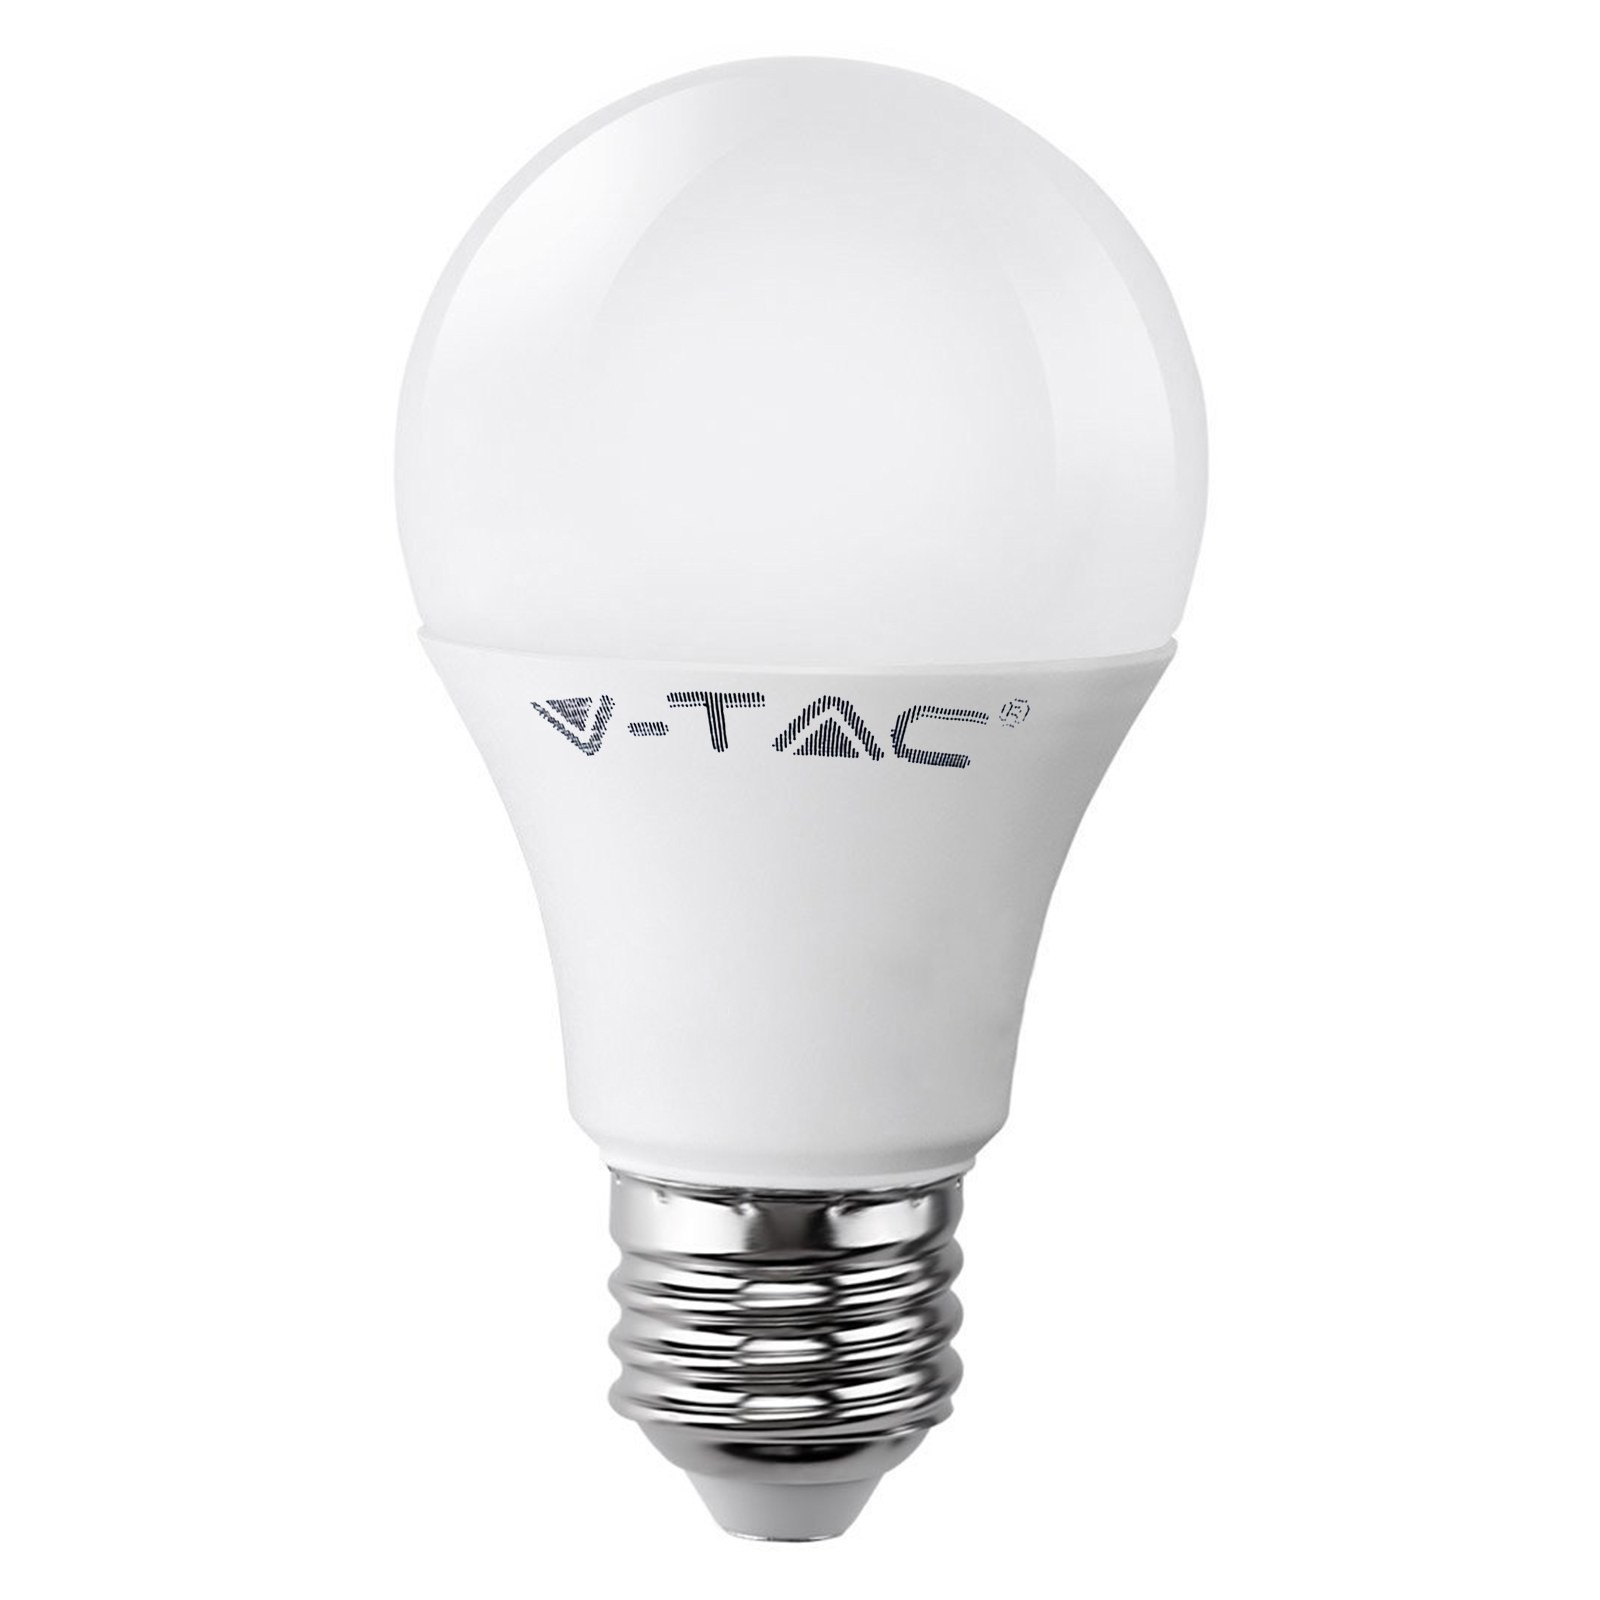 Risultati ricerca per: 'v tac' Area Illumina